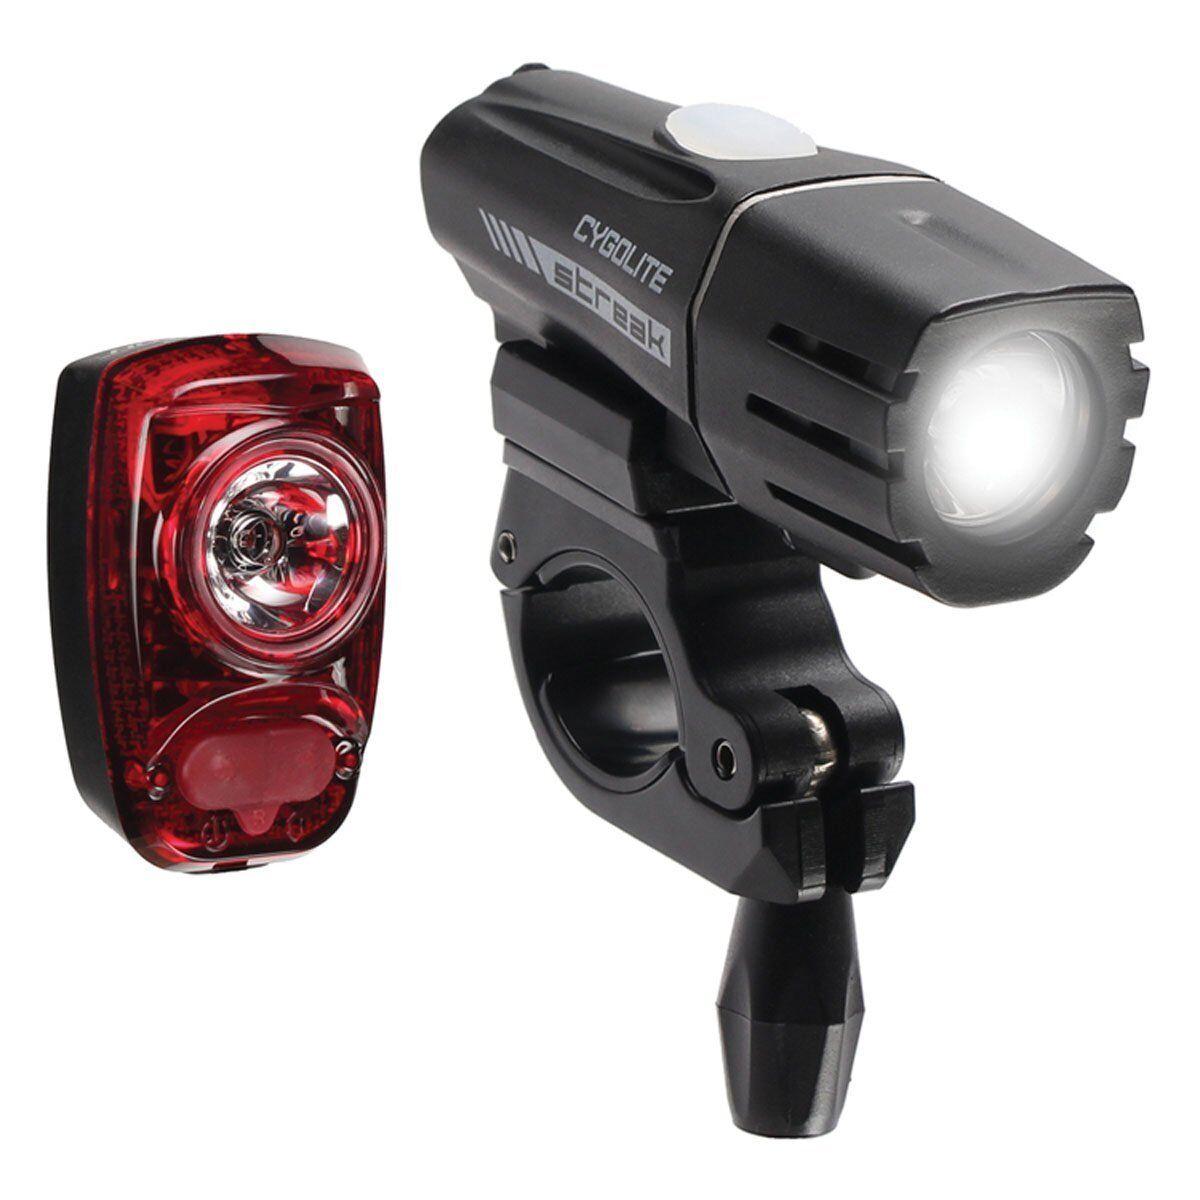 CYGOLITE  Streak 310 Headlight w  HOTSHOT SL Tail Light - NEW   combo kit  discount sale